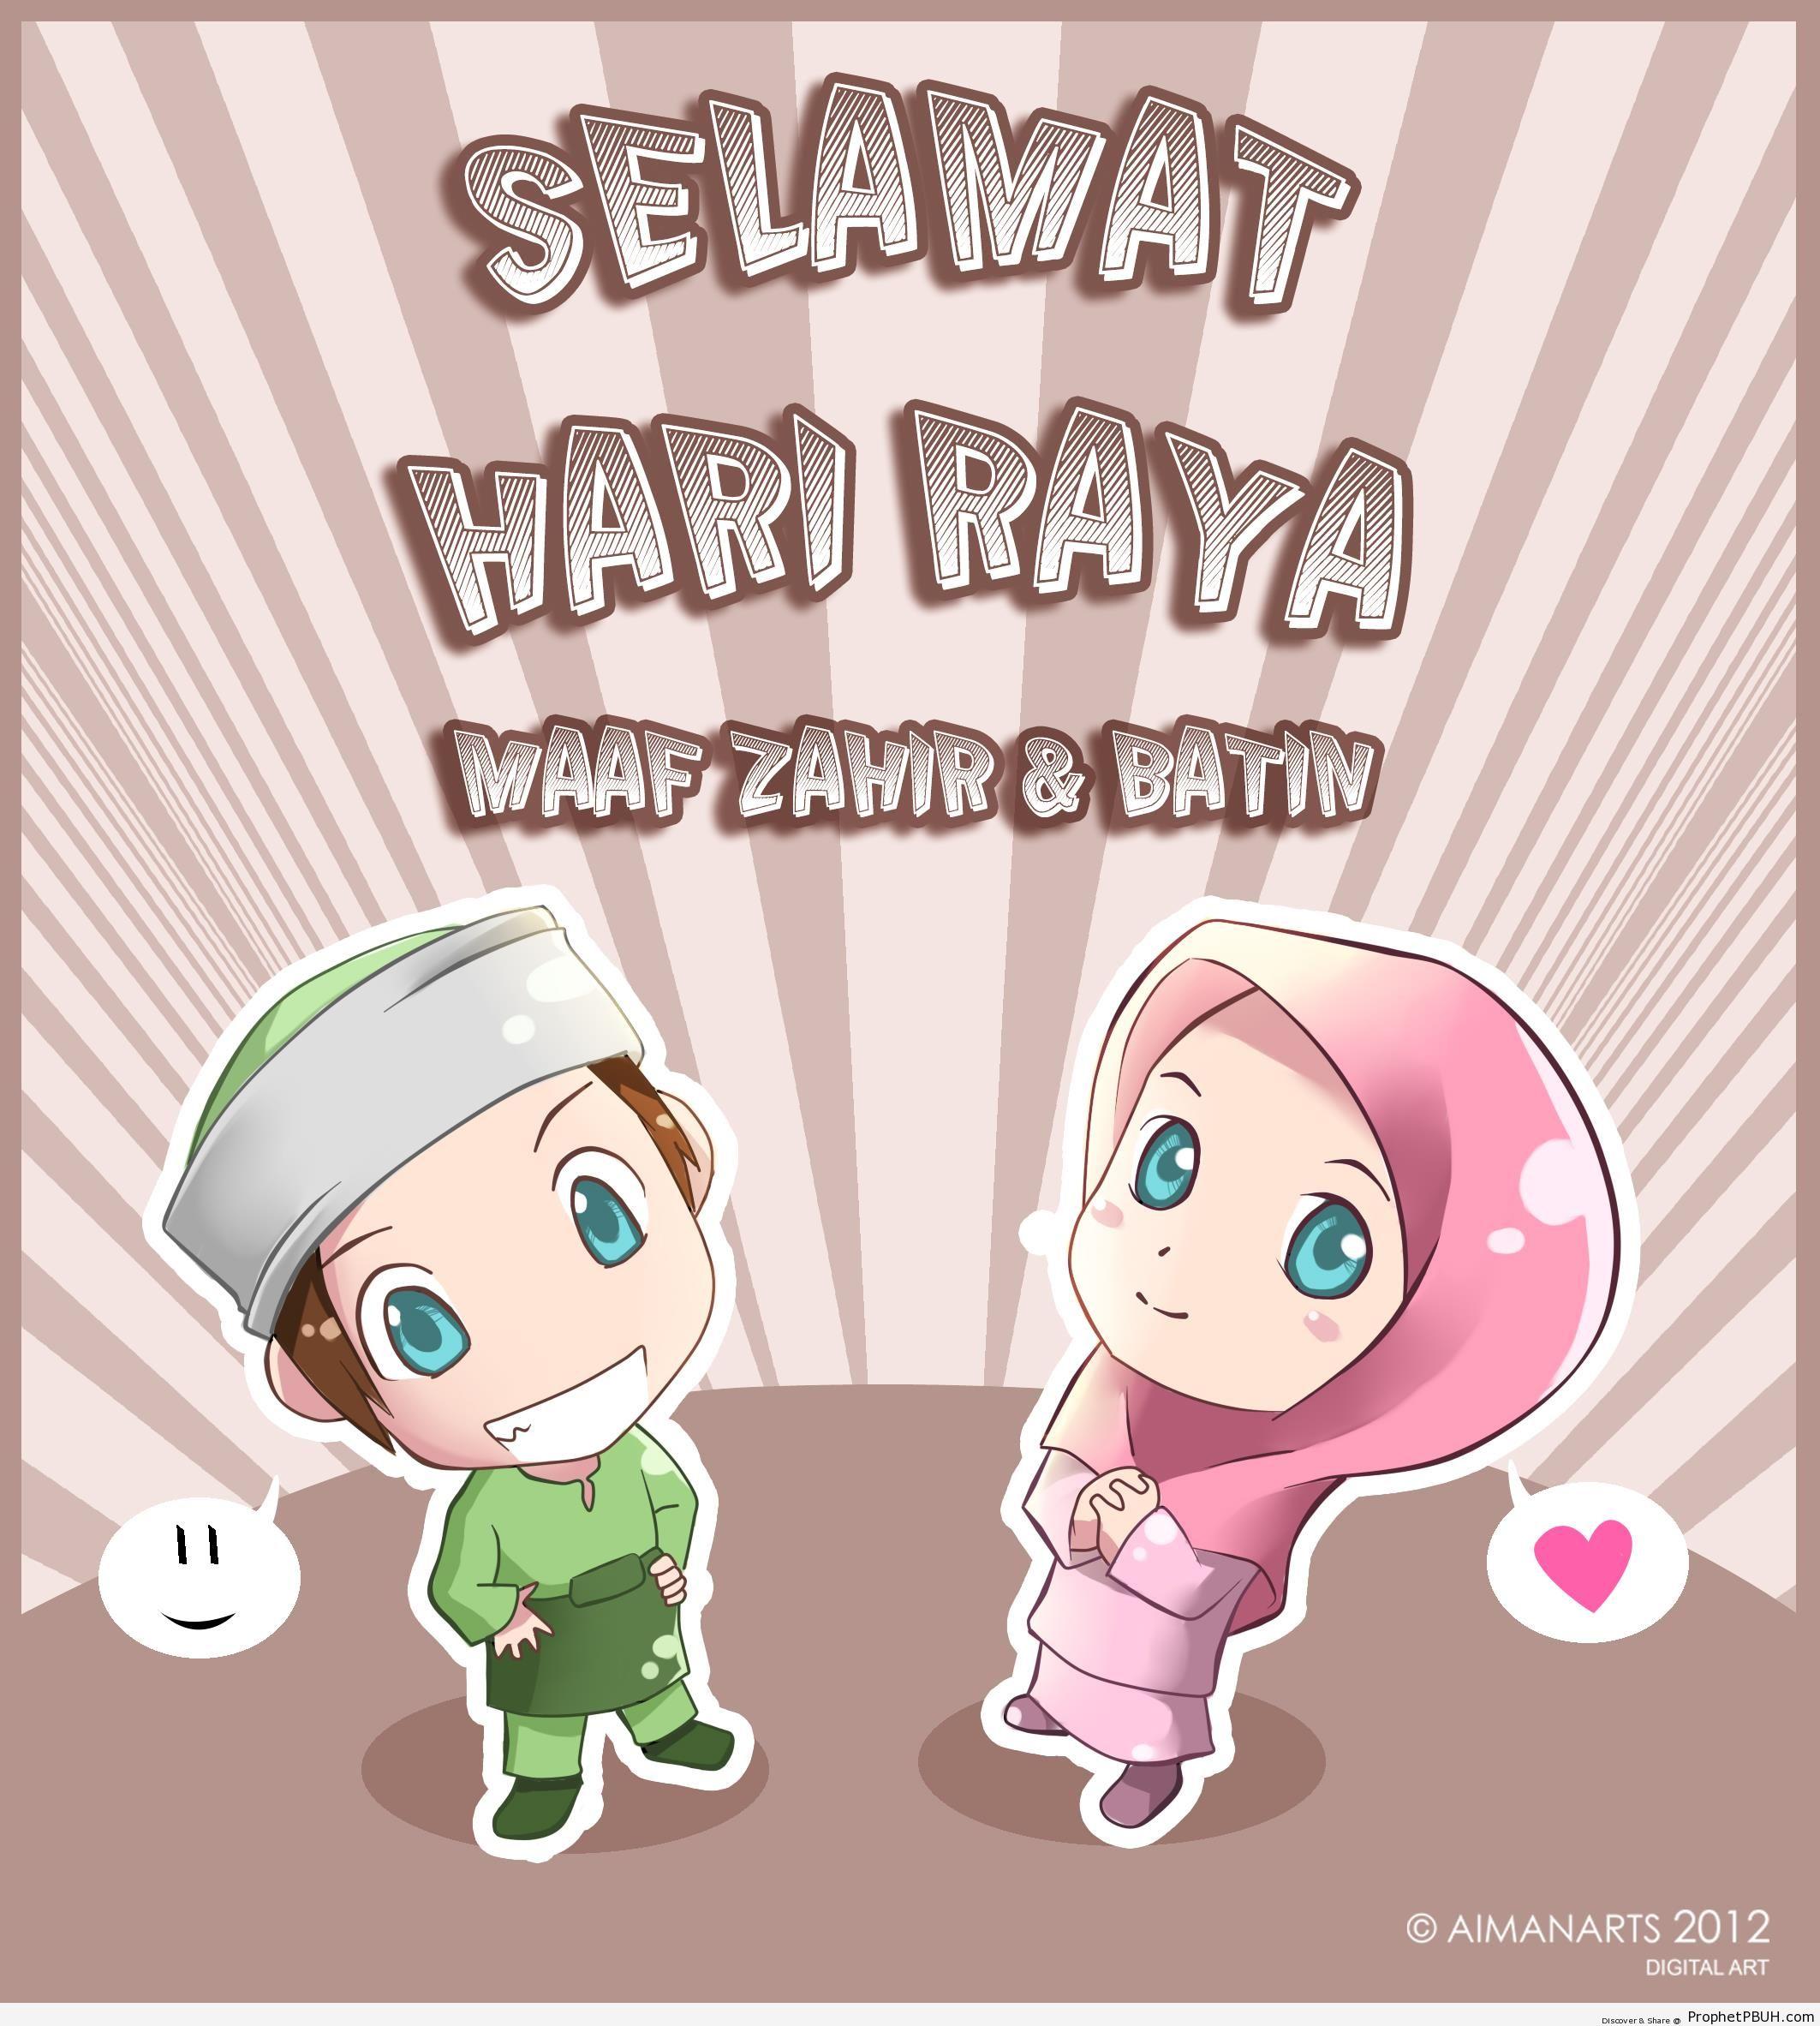 Selamat hari raya malaysian happy eid greeting on image of selamat hari raya malaysian happy eid greeting on image of little muslim boy and kristyandbryce Image collections